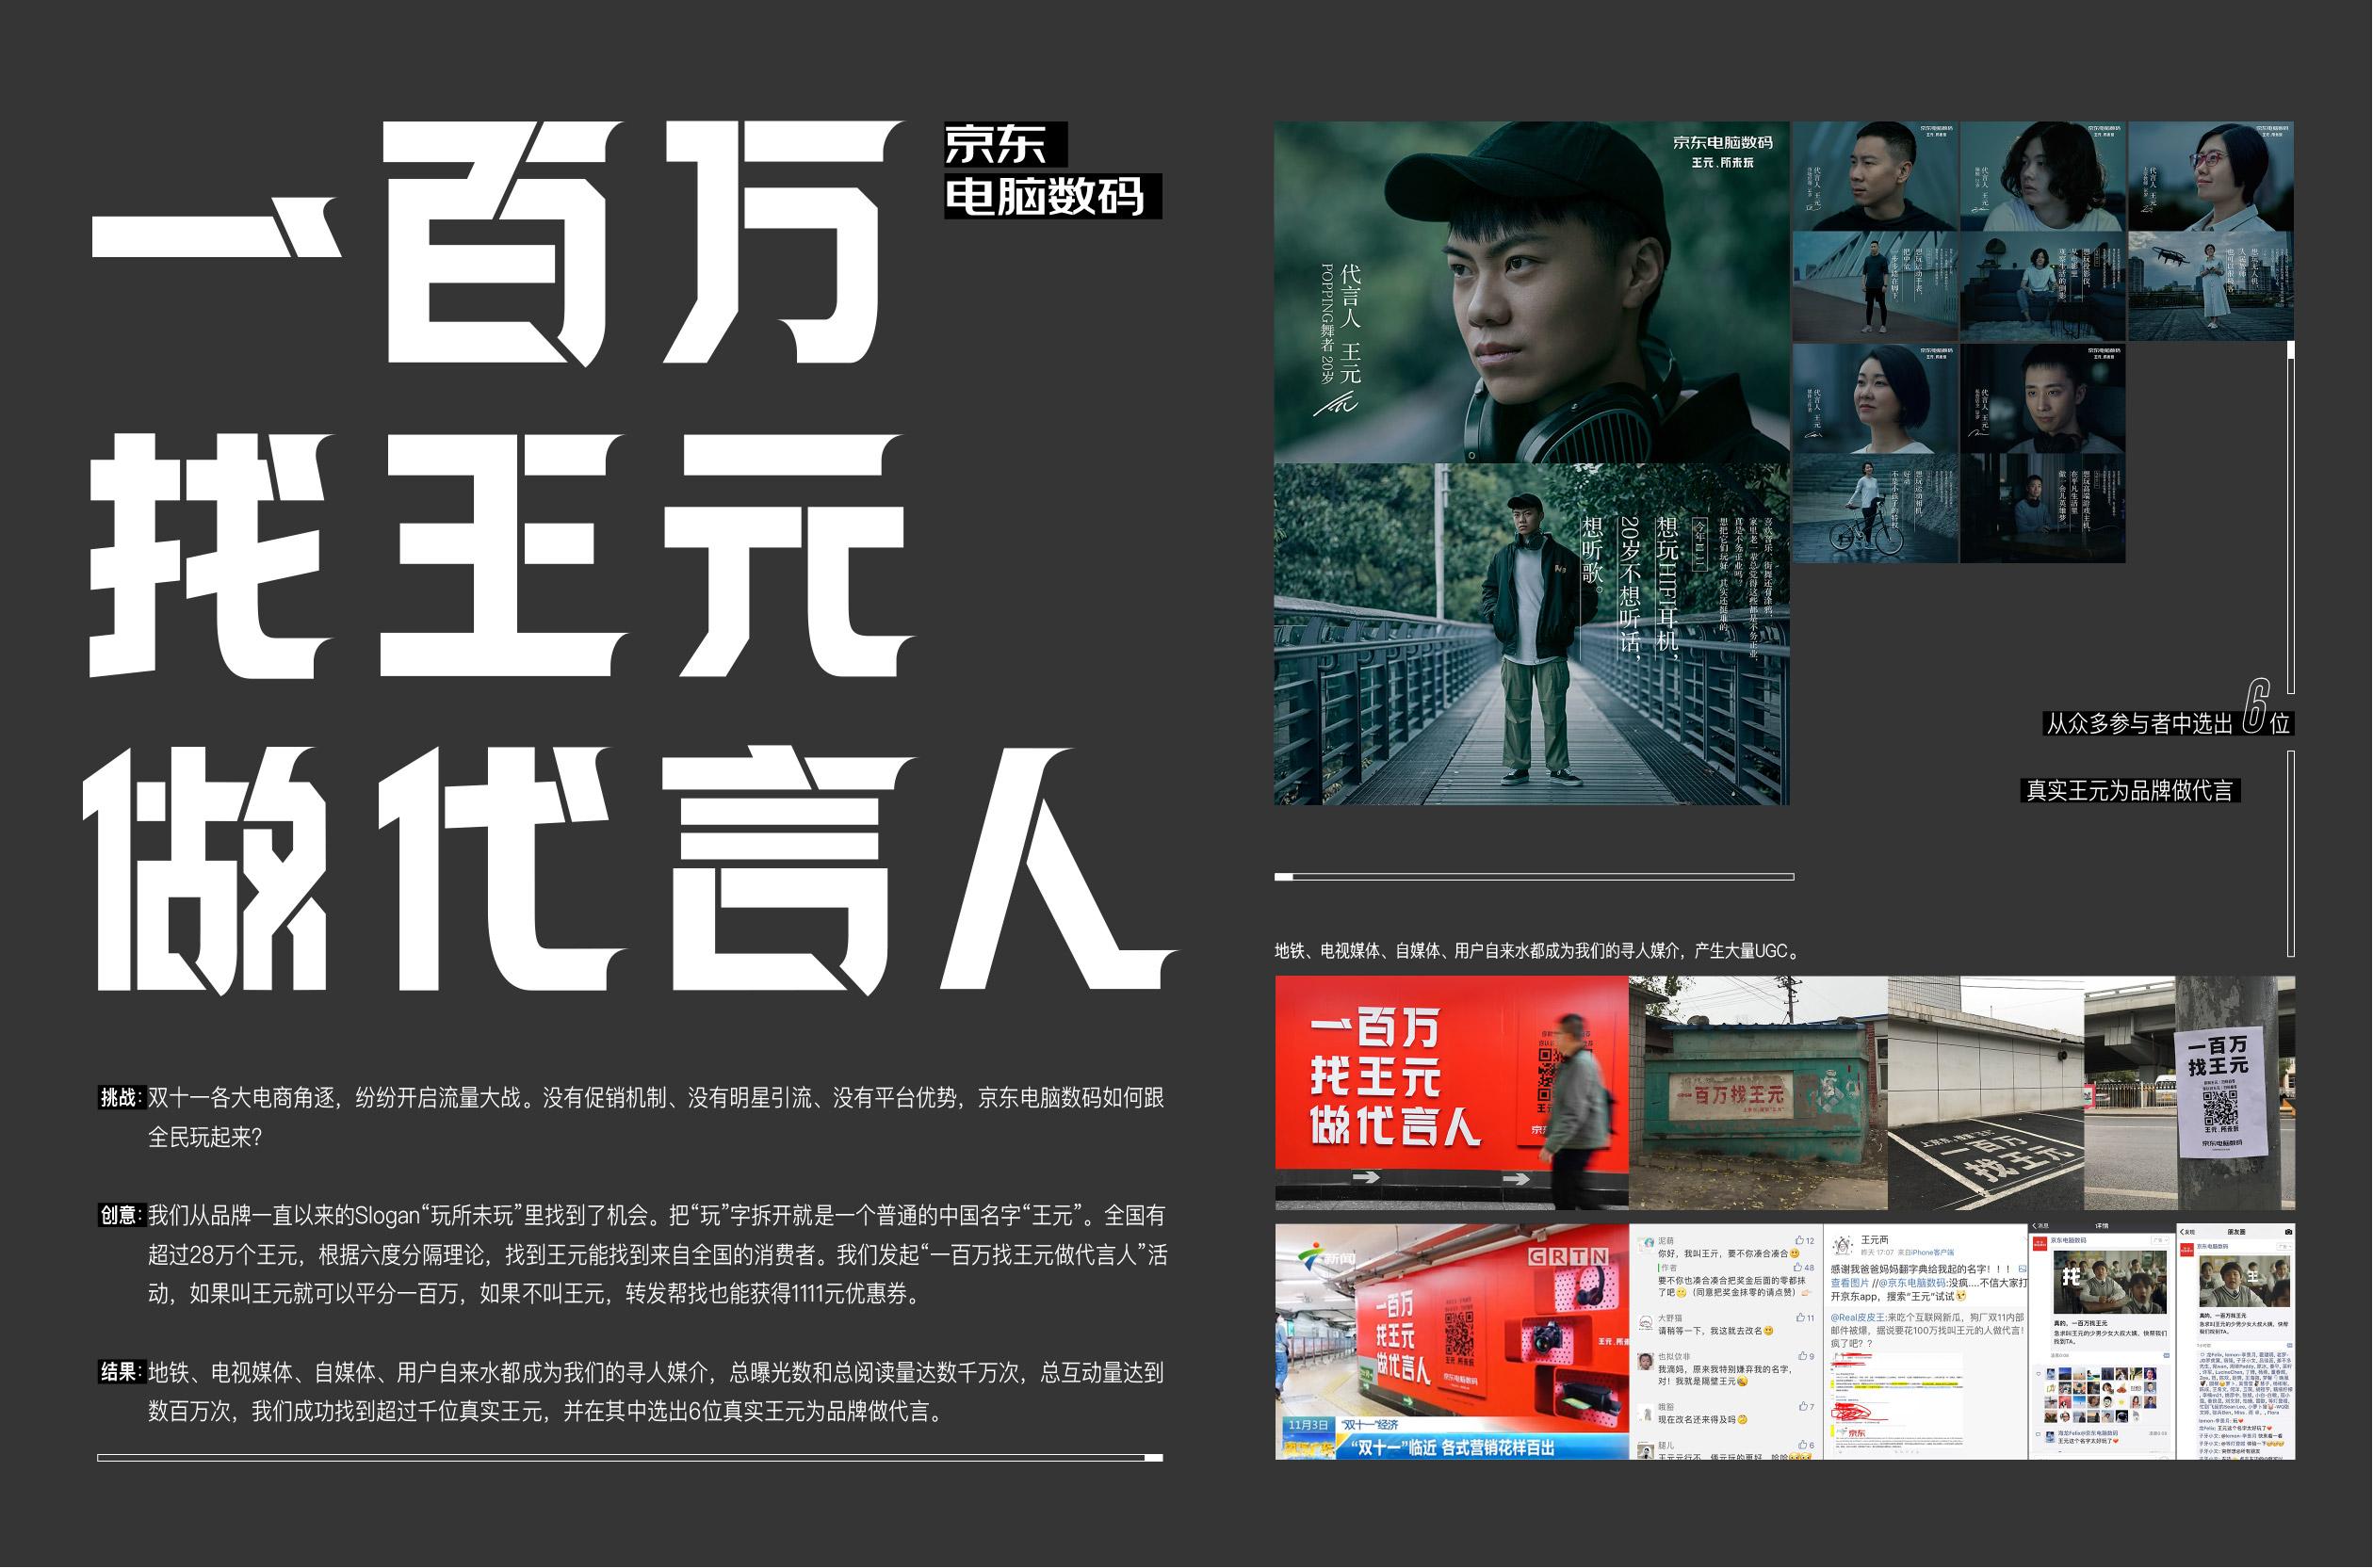 2019_cn_2019_e192-sn-160222014_hero_1